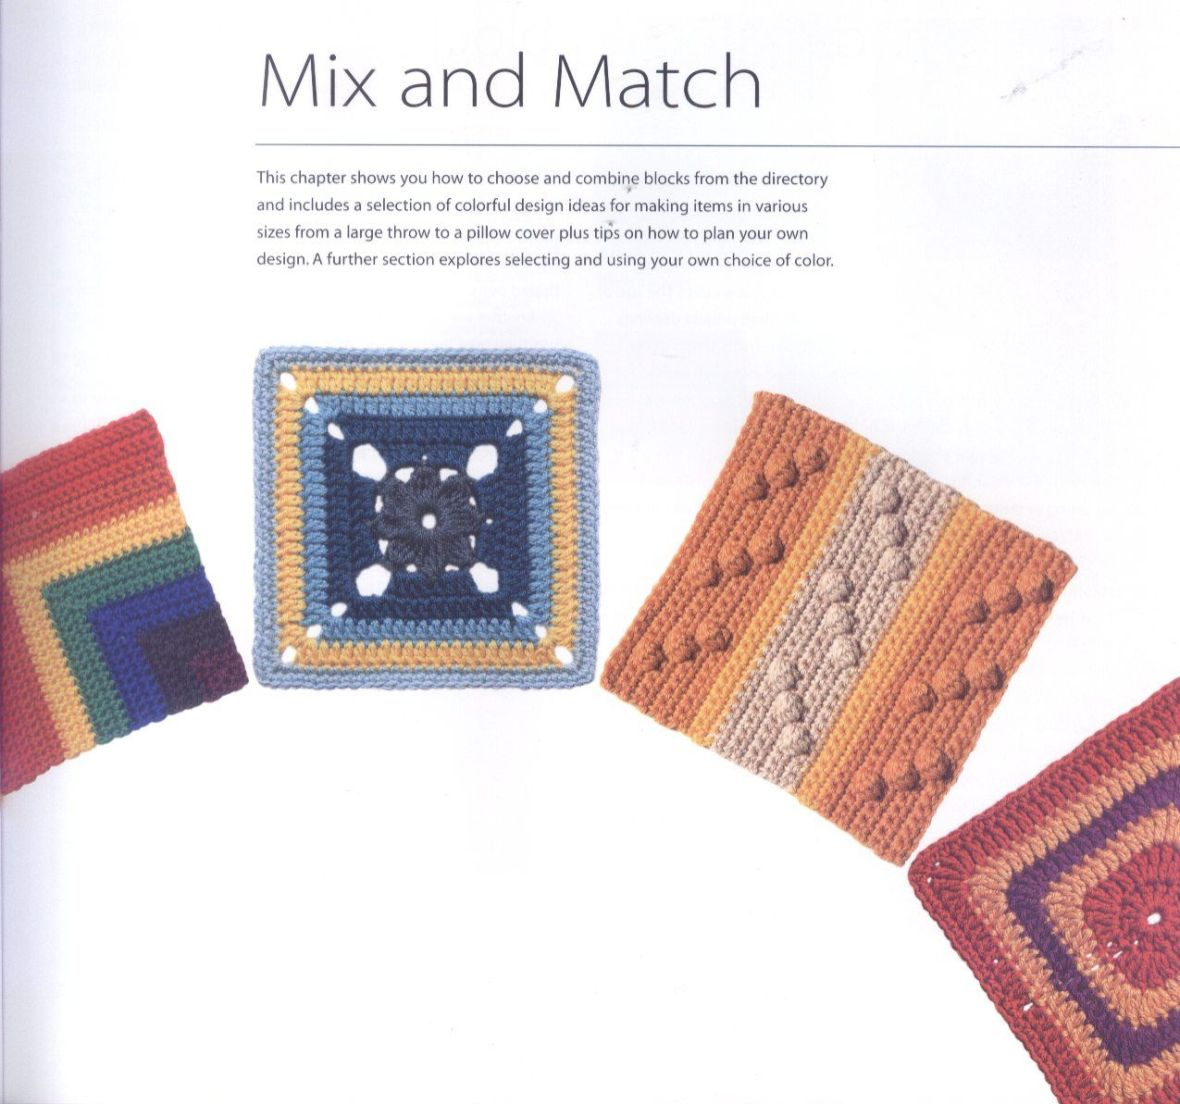 200 Crocheted Blocks for blankets, throws & Afghans 015